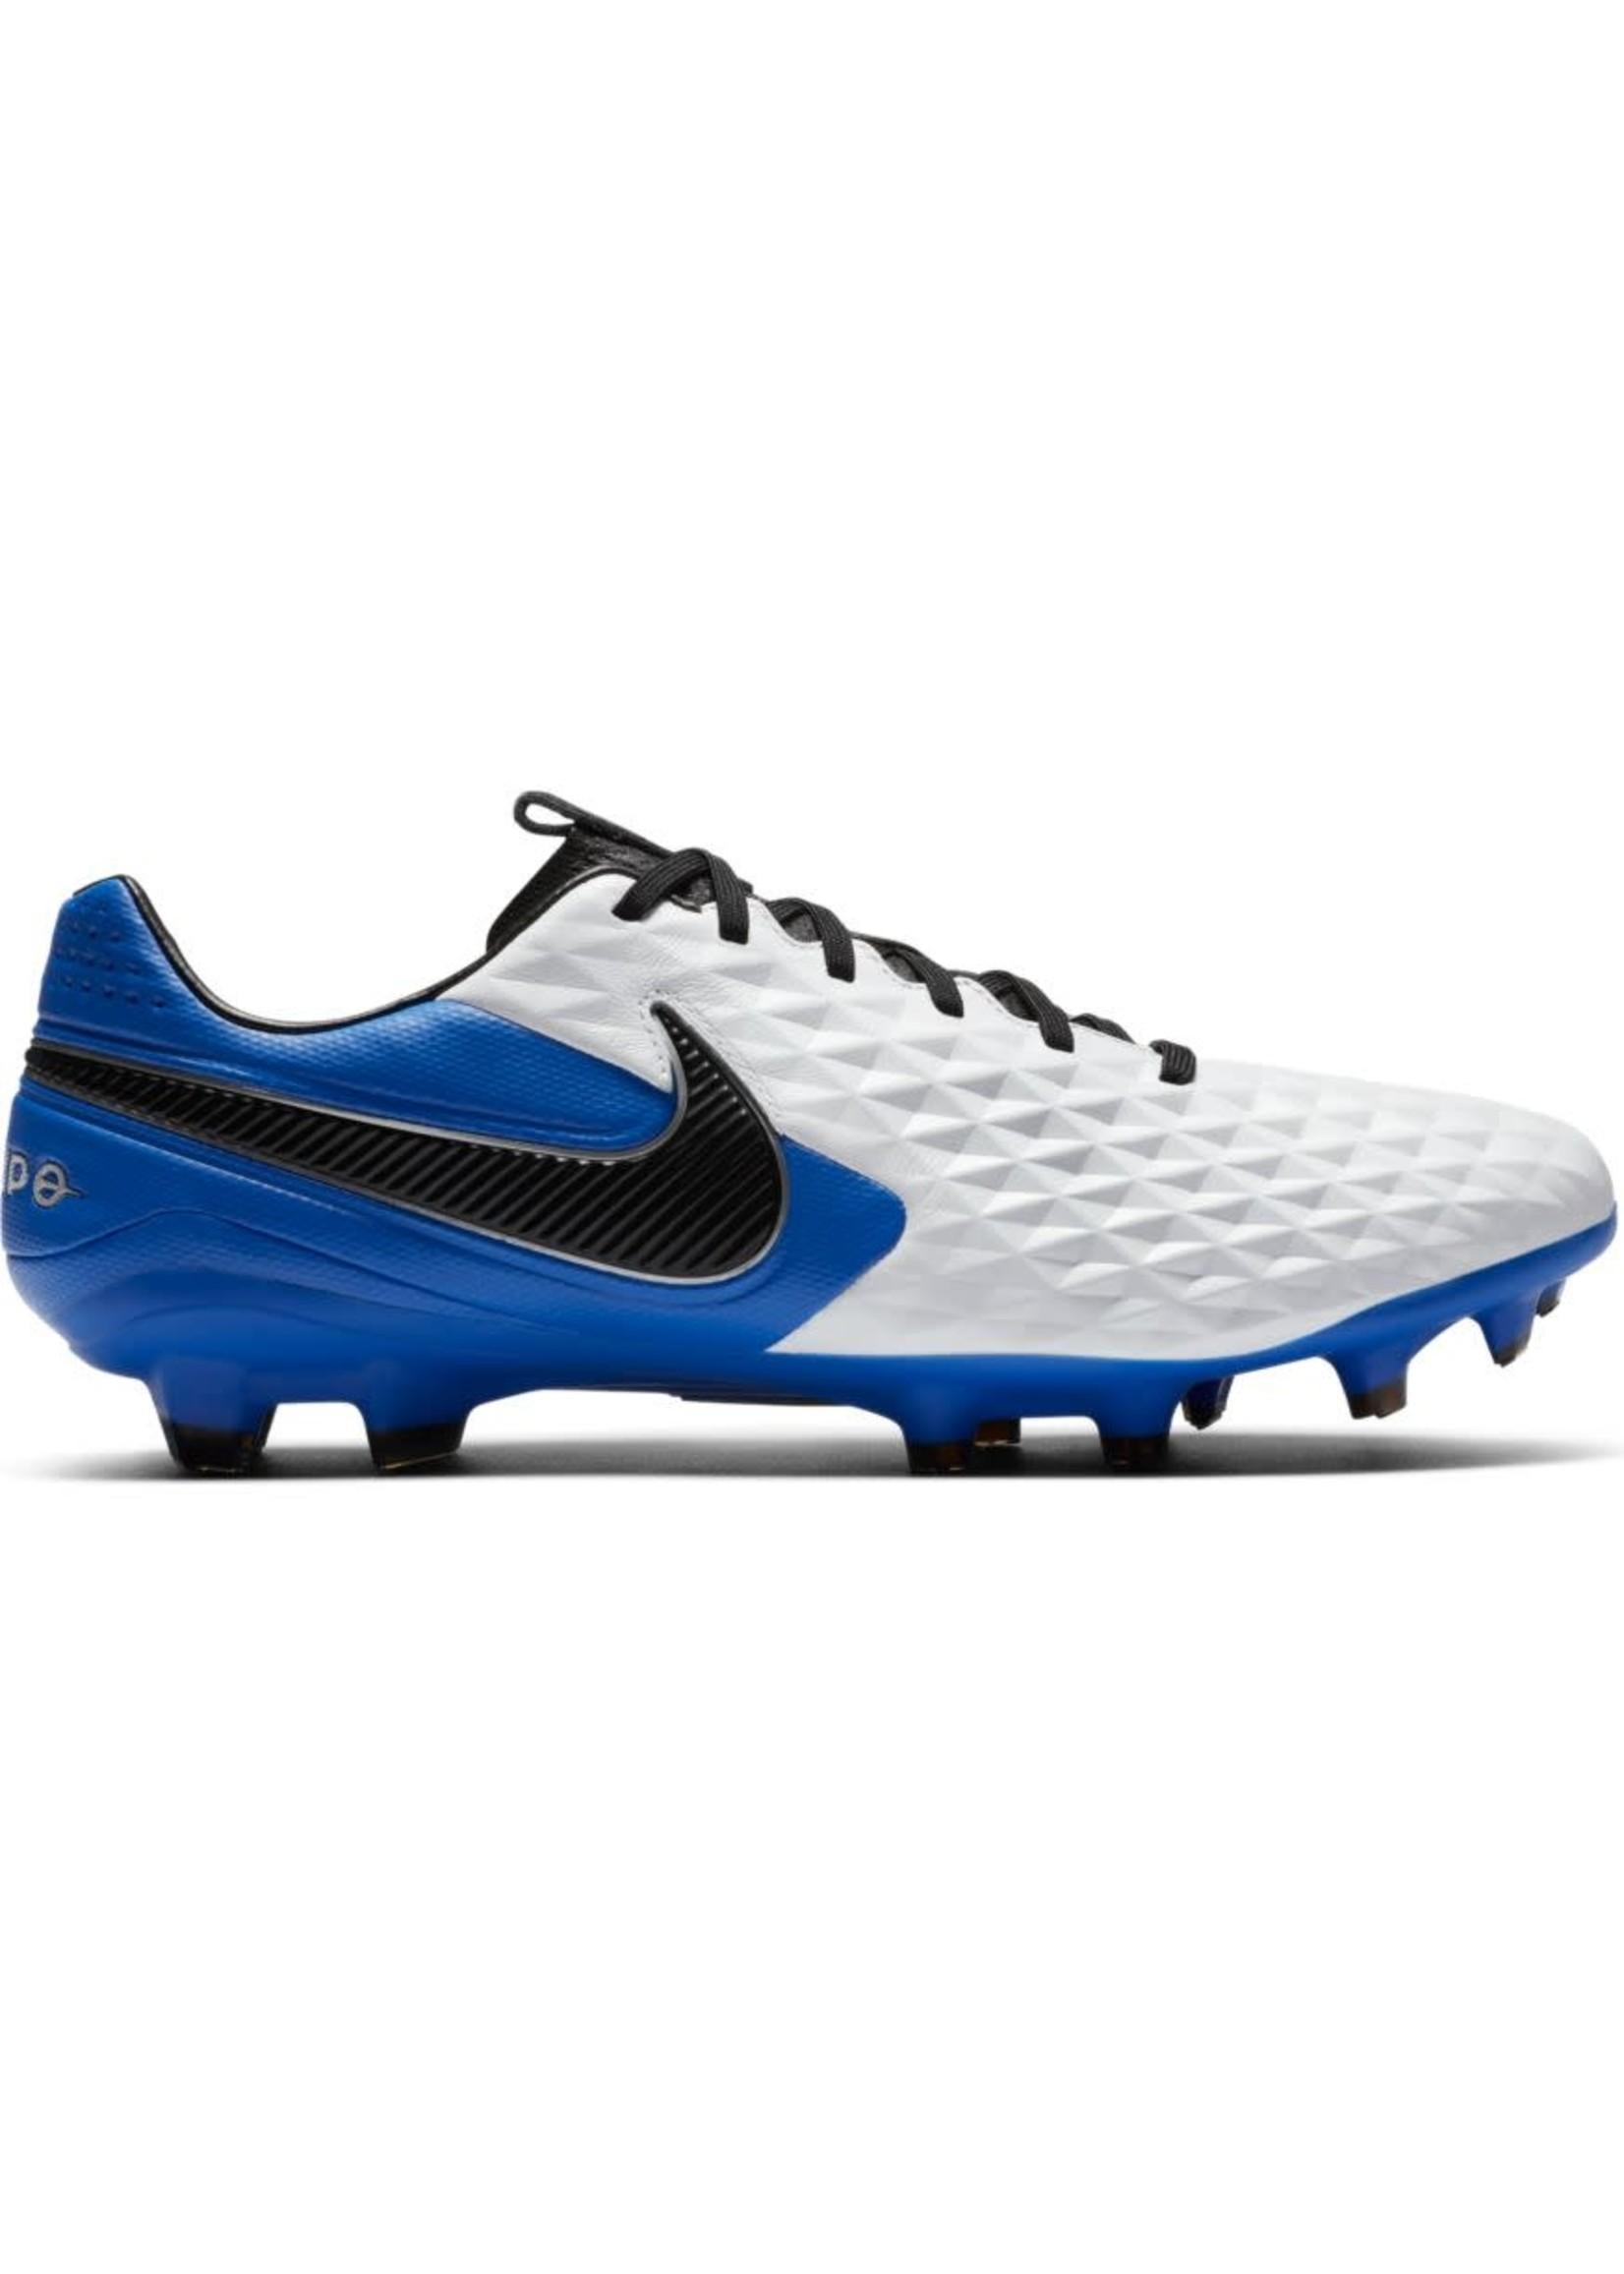 Nike Legend 8 Pro FG - White/Blue